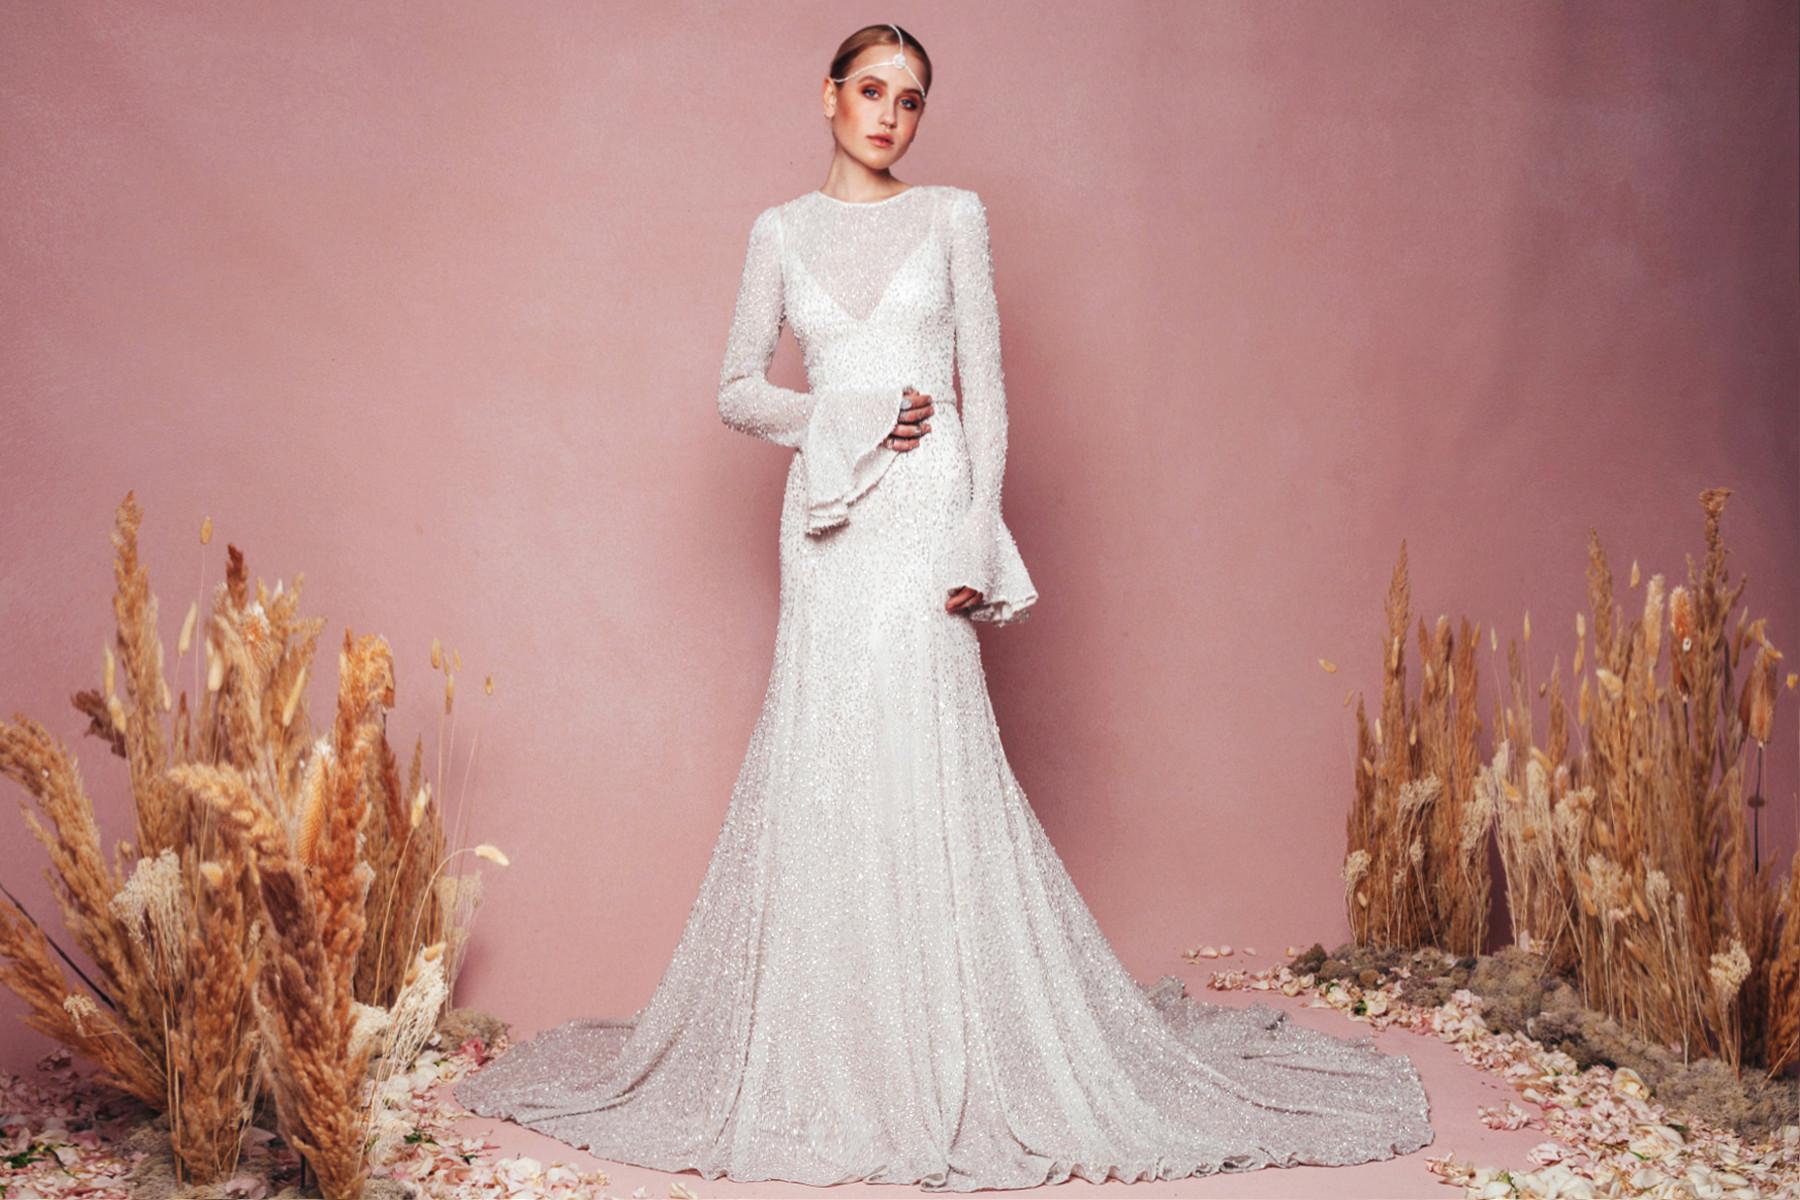 Lust-Worthy Long-Sleeved Wedding Dresses